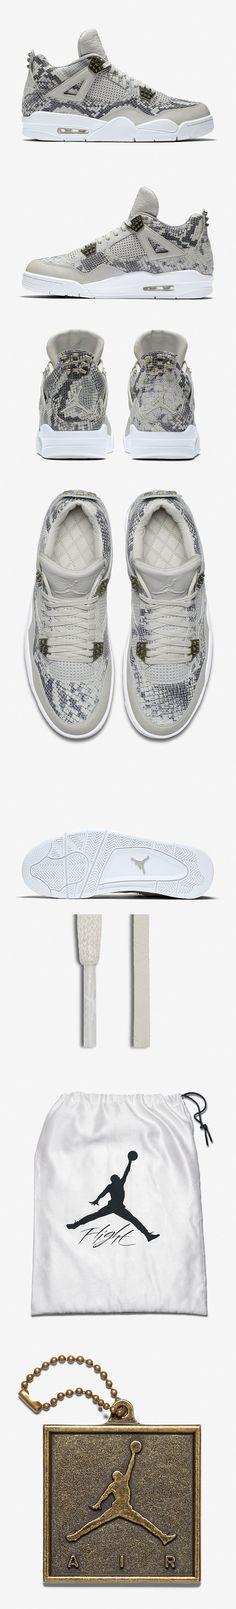 "Air Jordan 4 Retro Premium ""Snakeskin"" - EU Kicks: Sneaker Magazine"